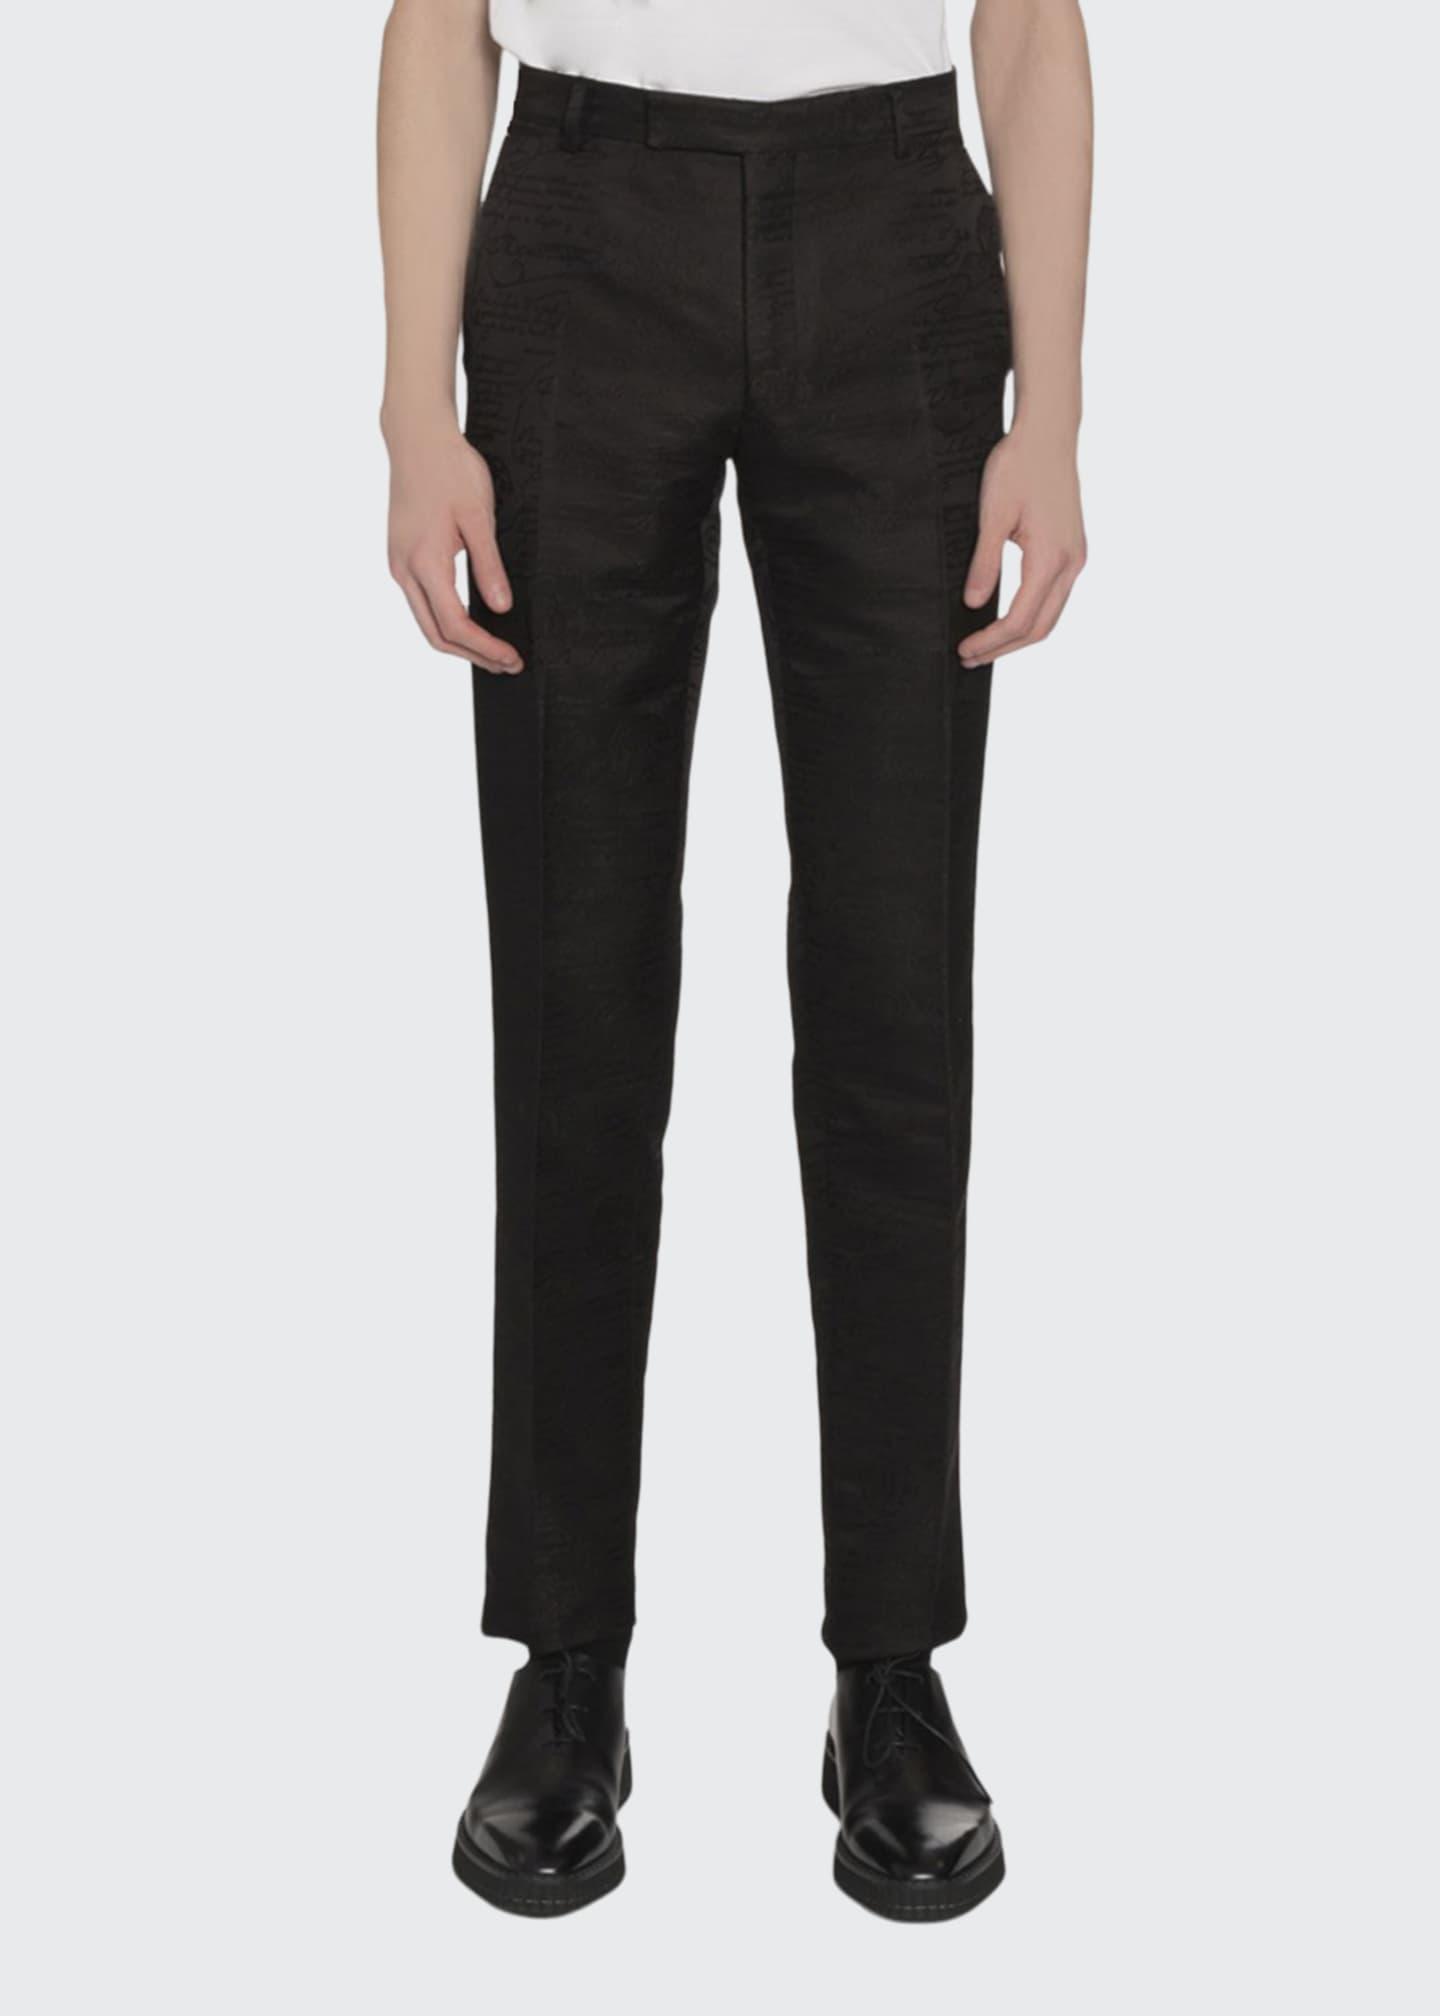 Berluti Men's Wool-Blend Scritto Jacquard Tapered Pants